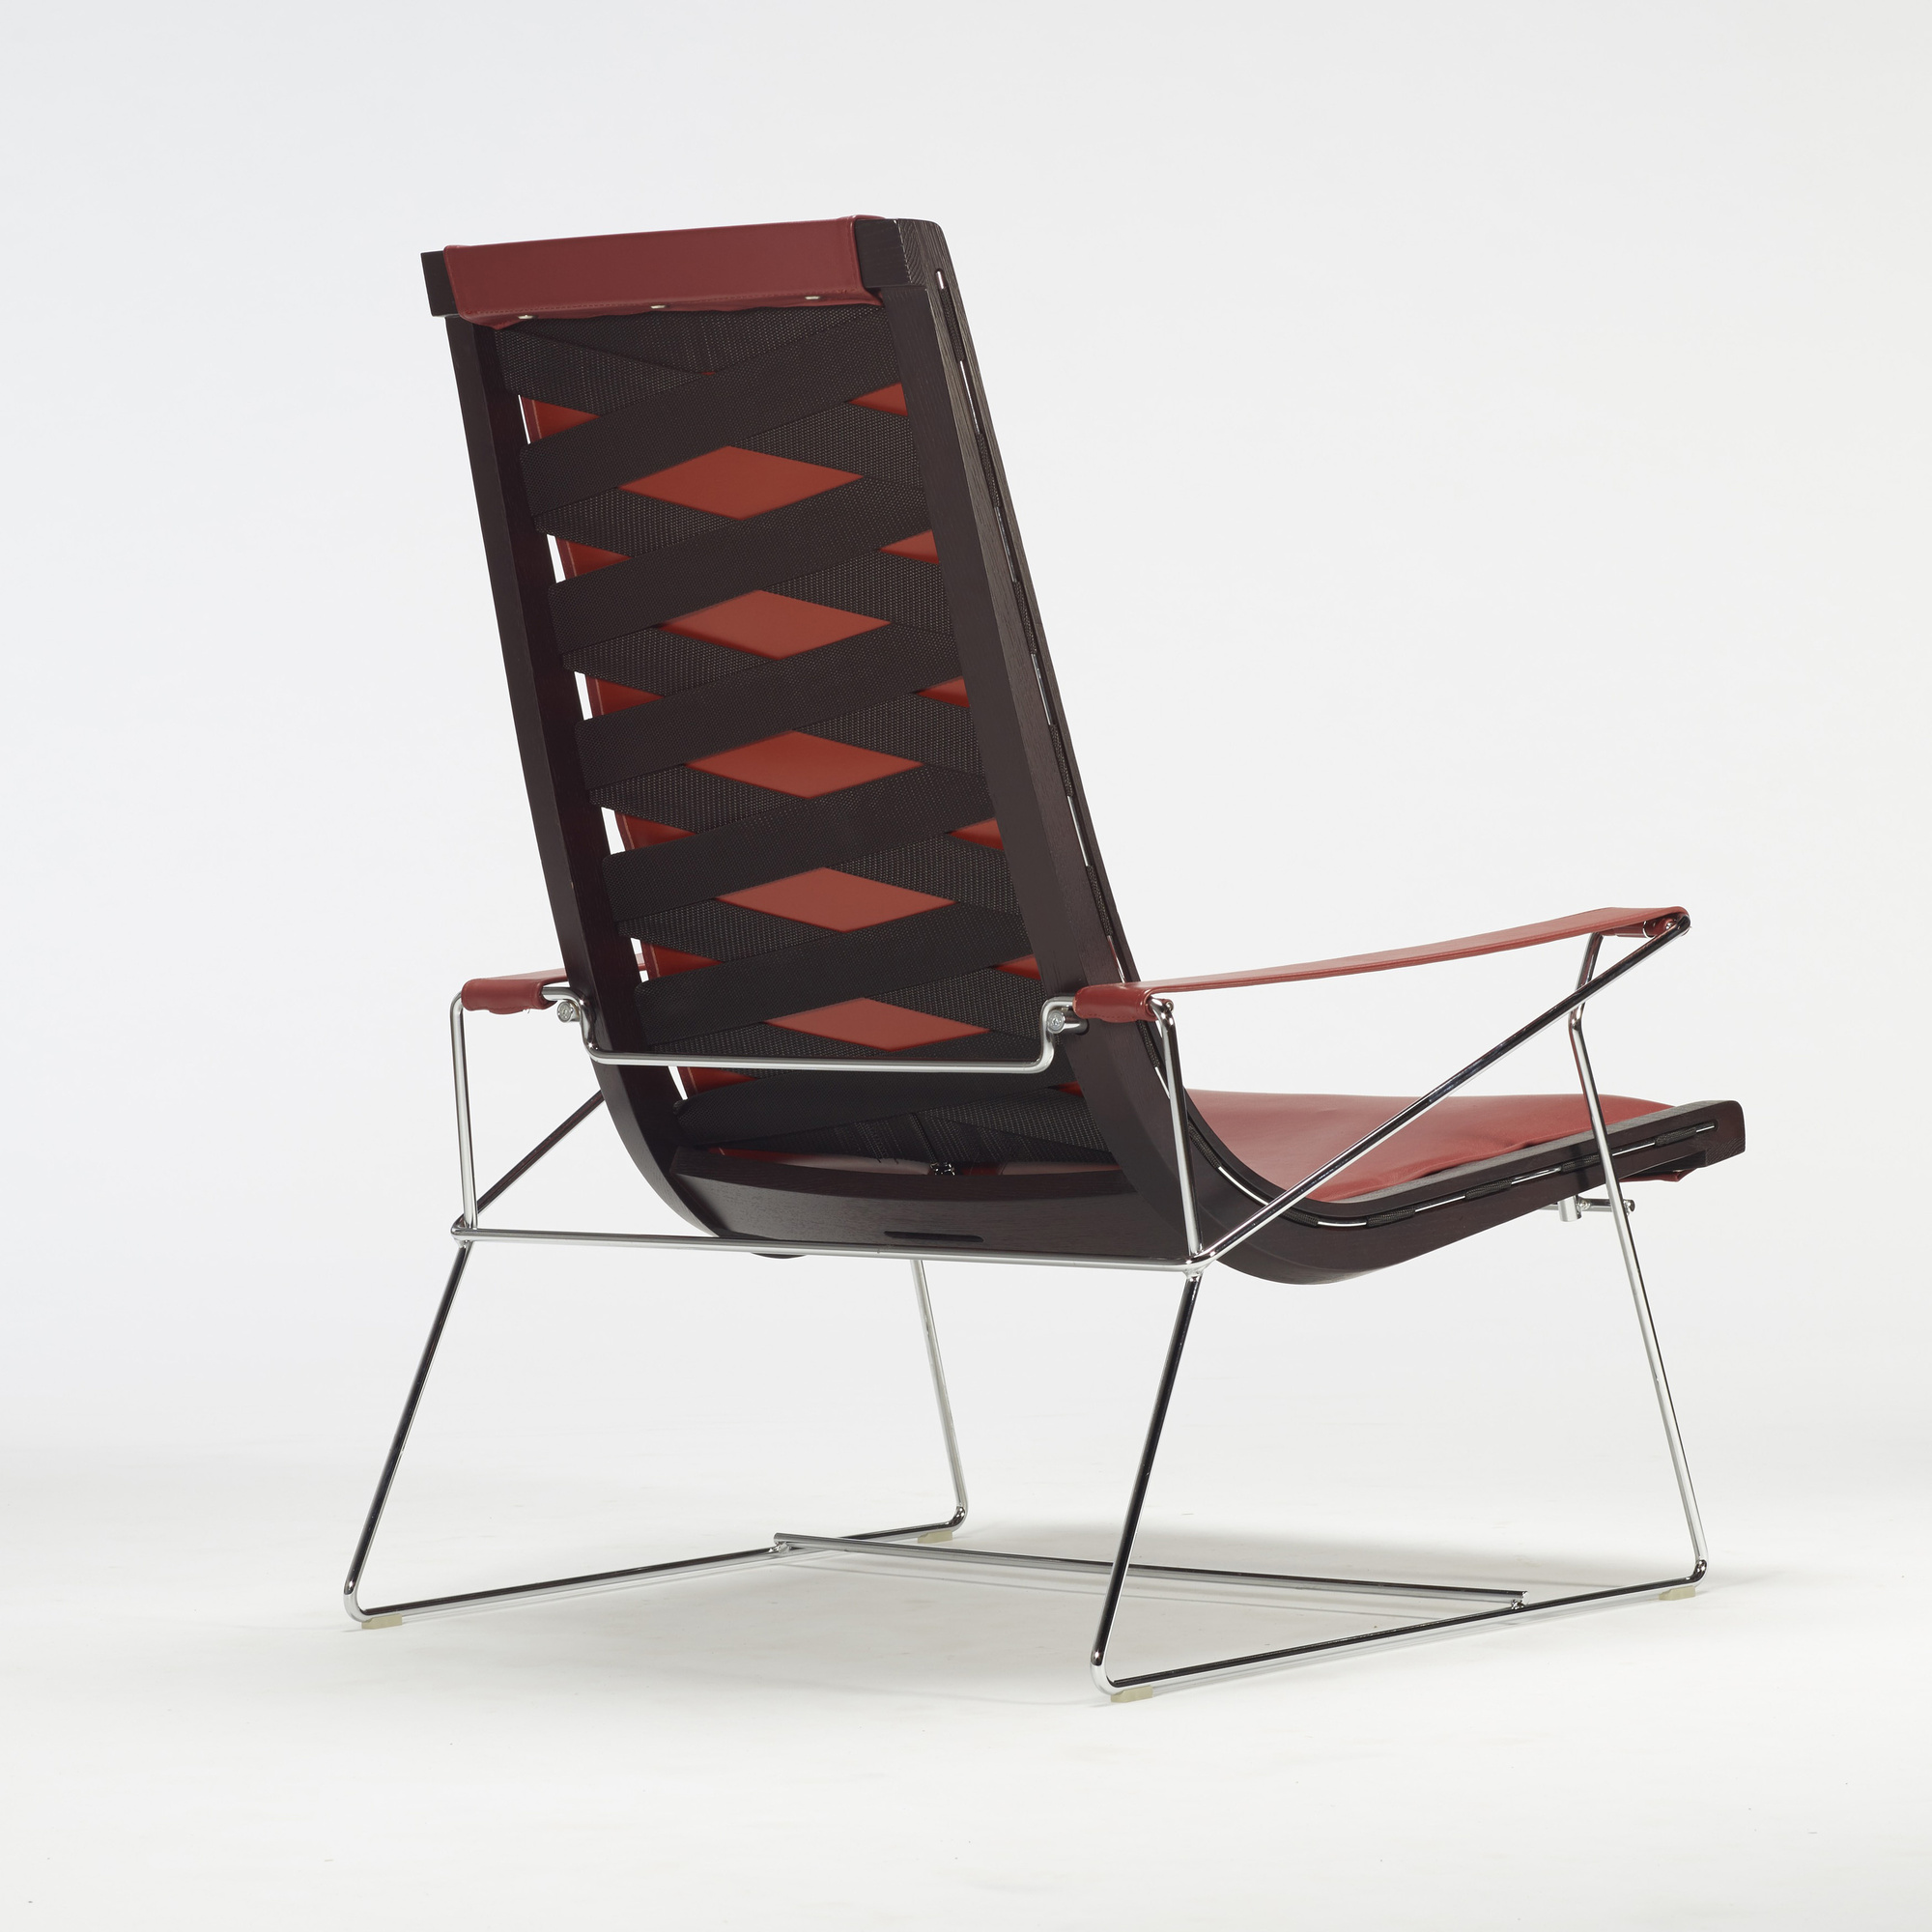 206: Antonio Citterio / J.J. armchair (3 of 3)